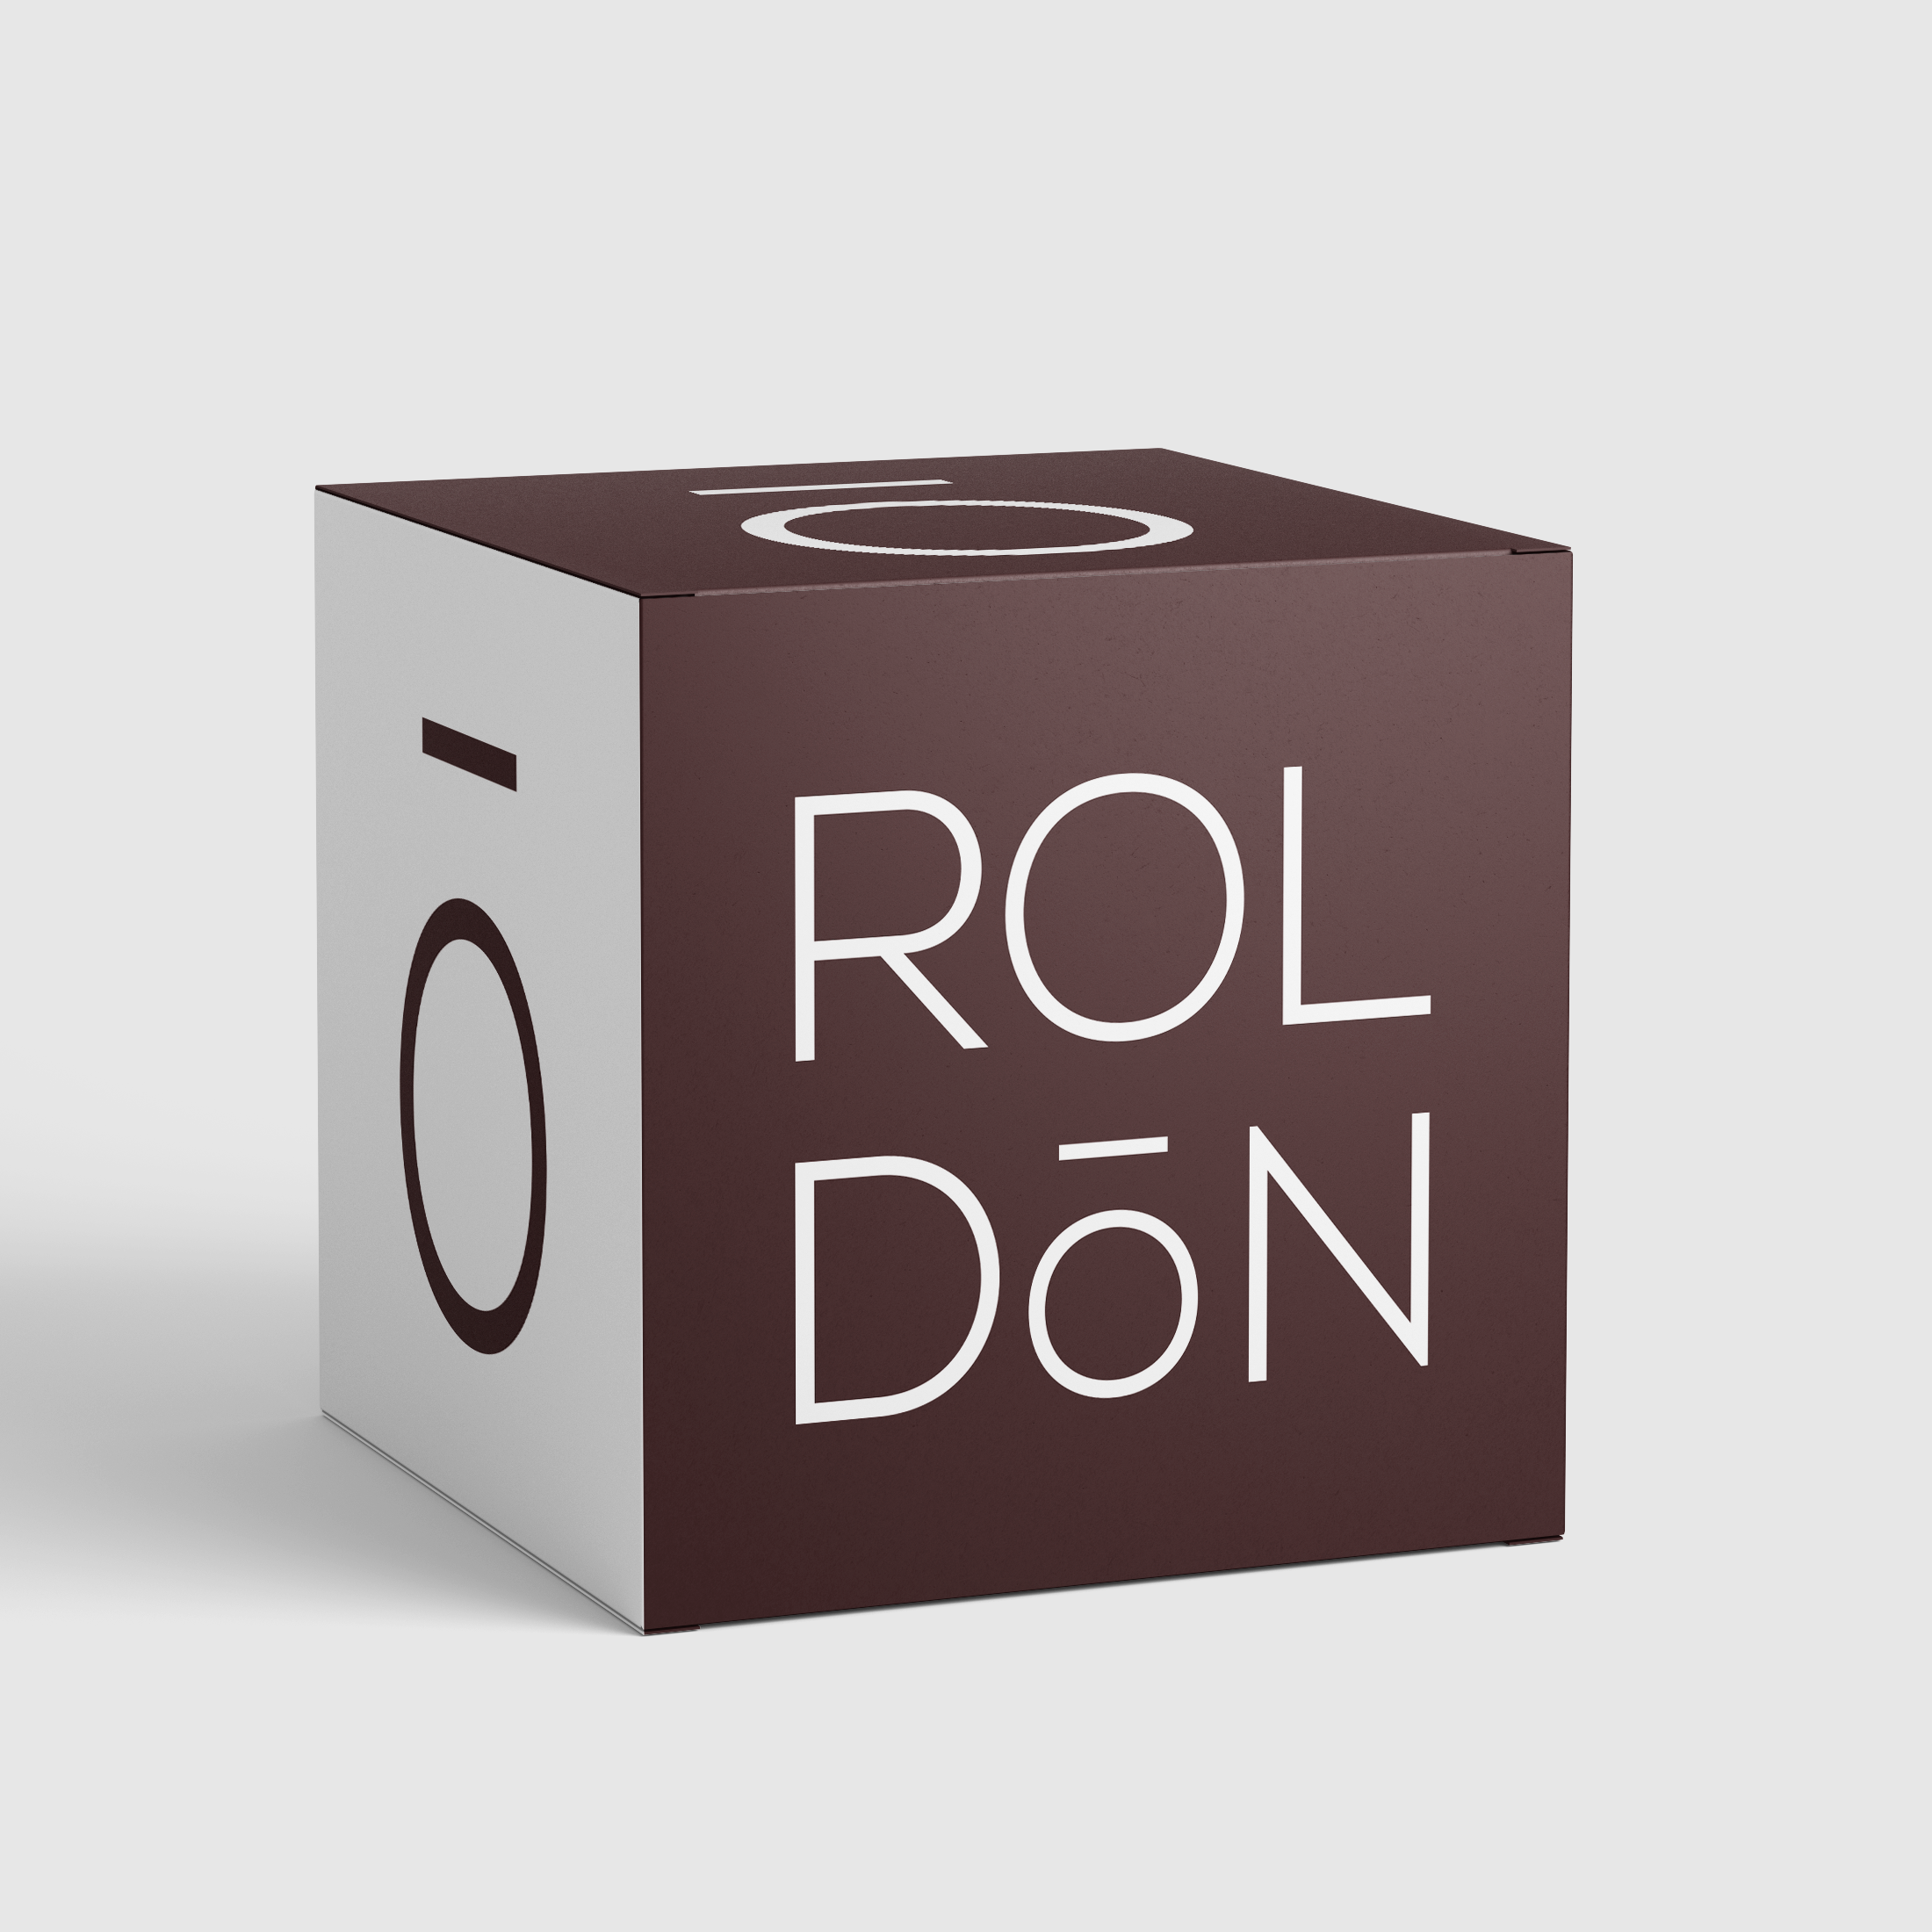 http://auppa.com/wp-content/uploads/2019/09/roldon-box.png